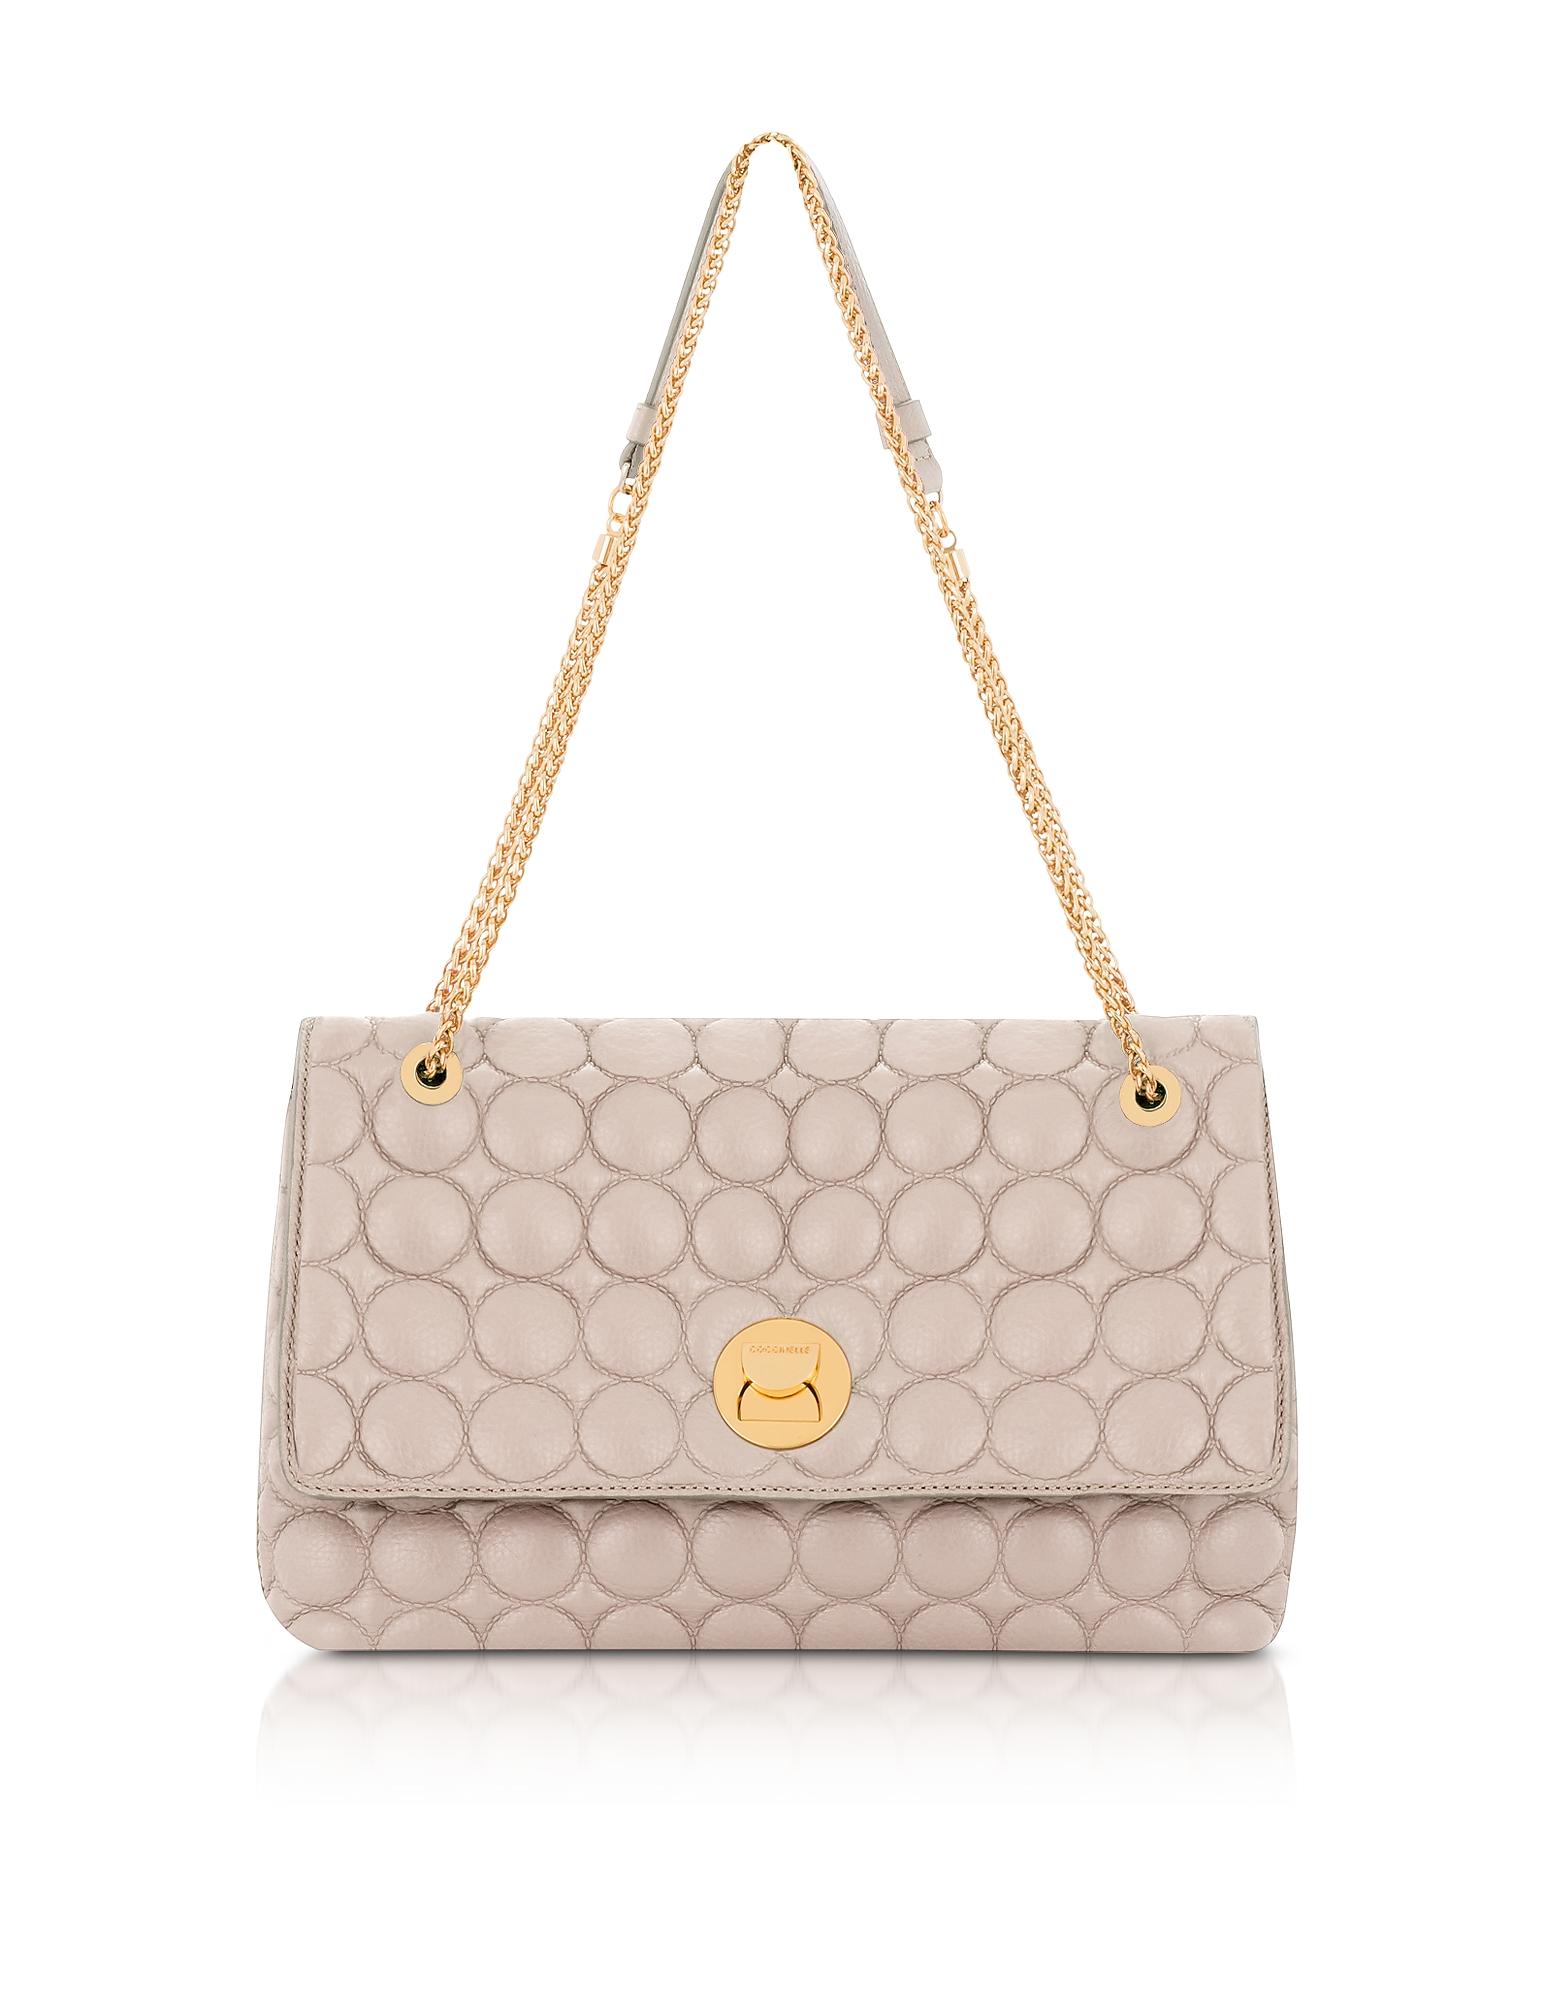 Coccinelle Handbags, Liya Quilted Leather Shoulder Bag